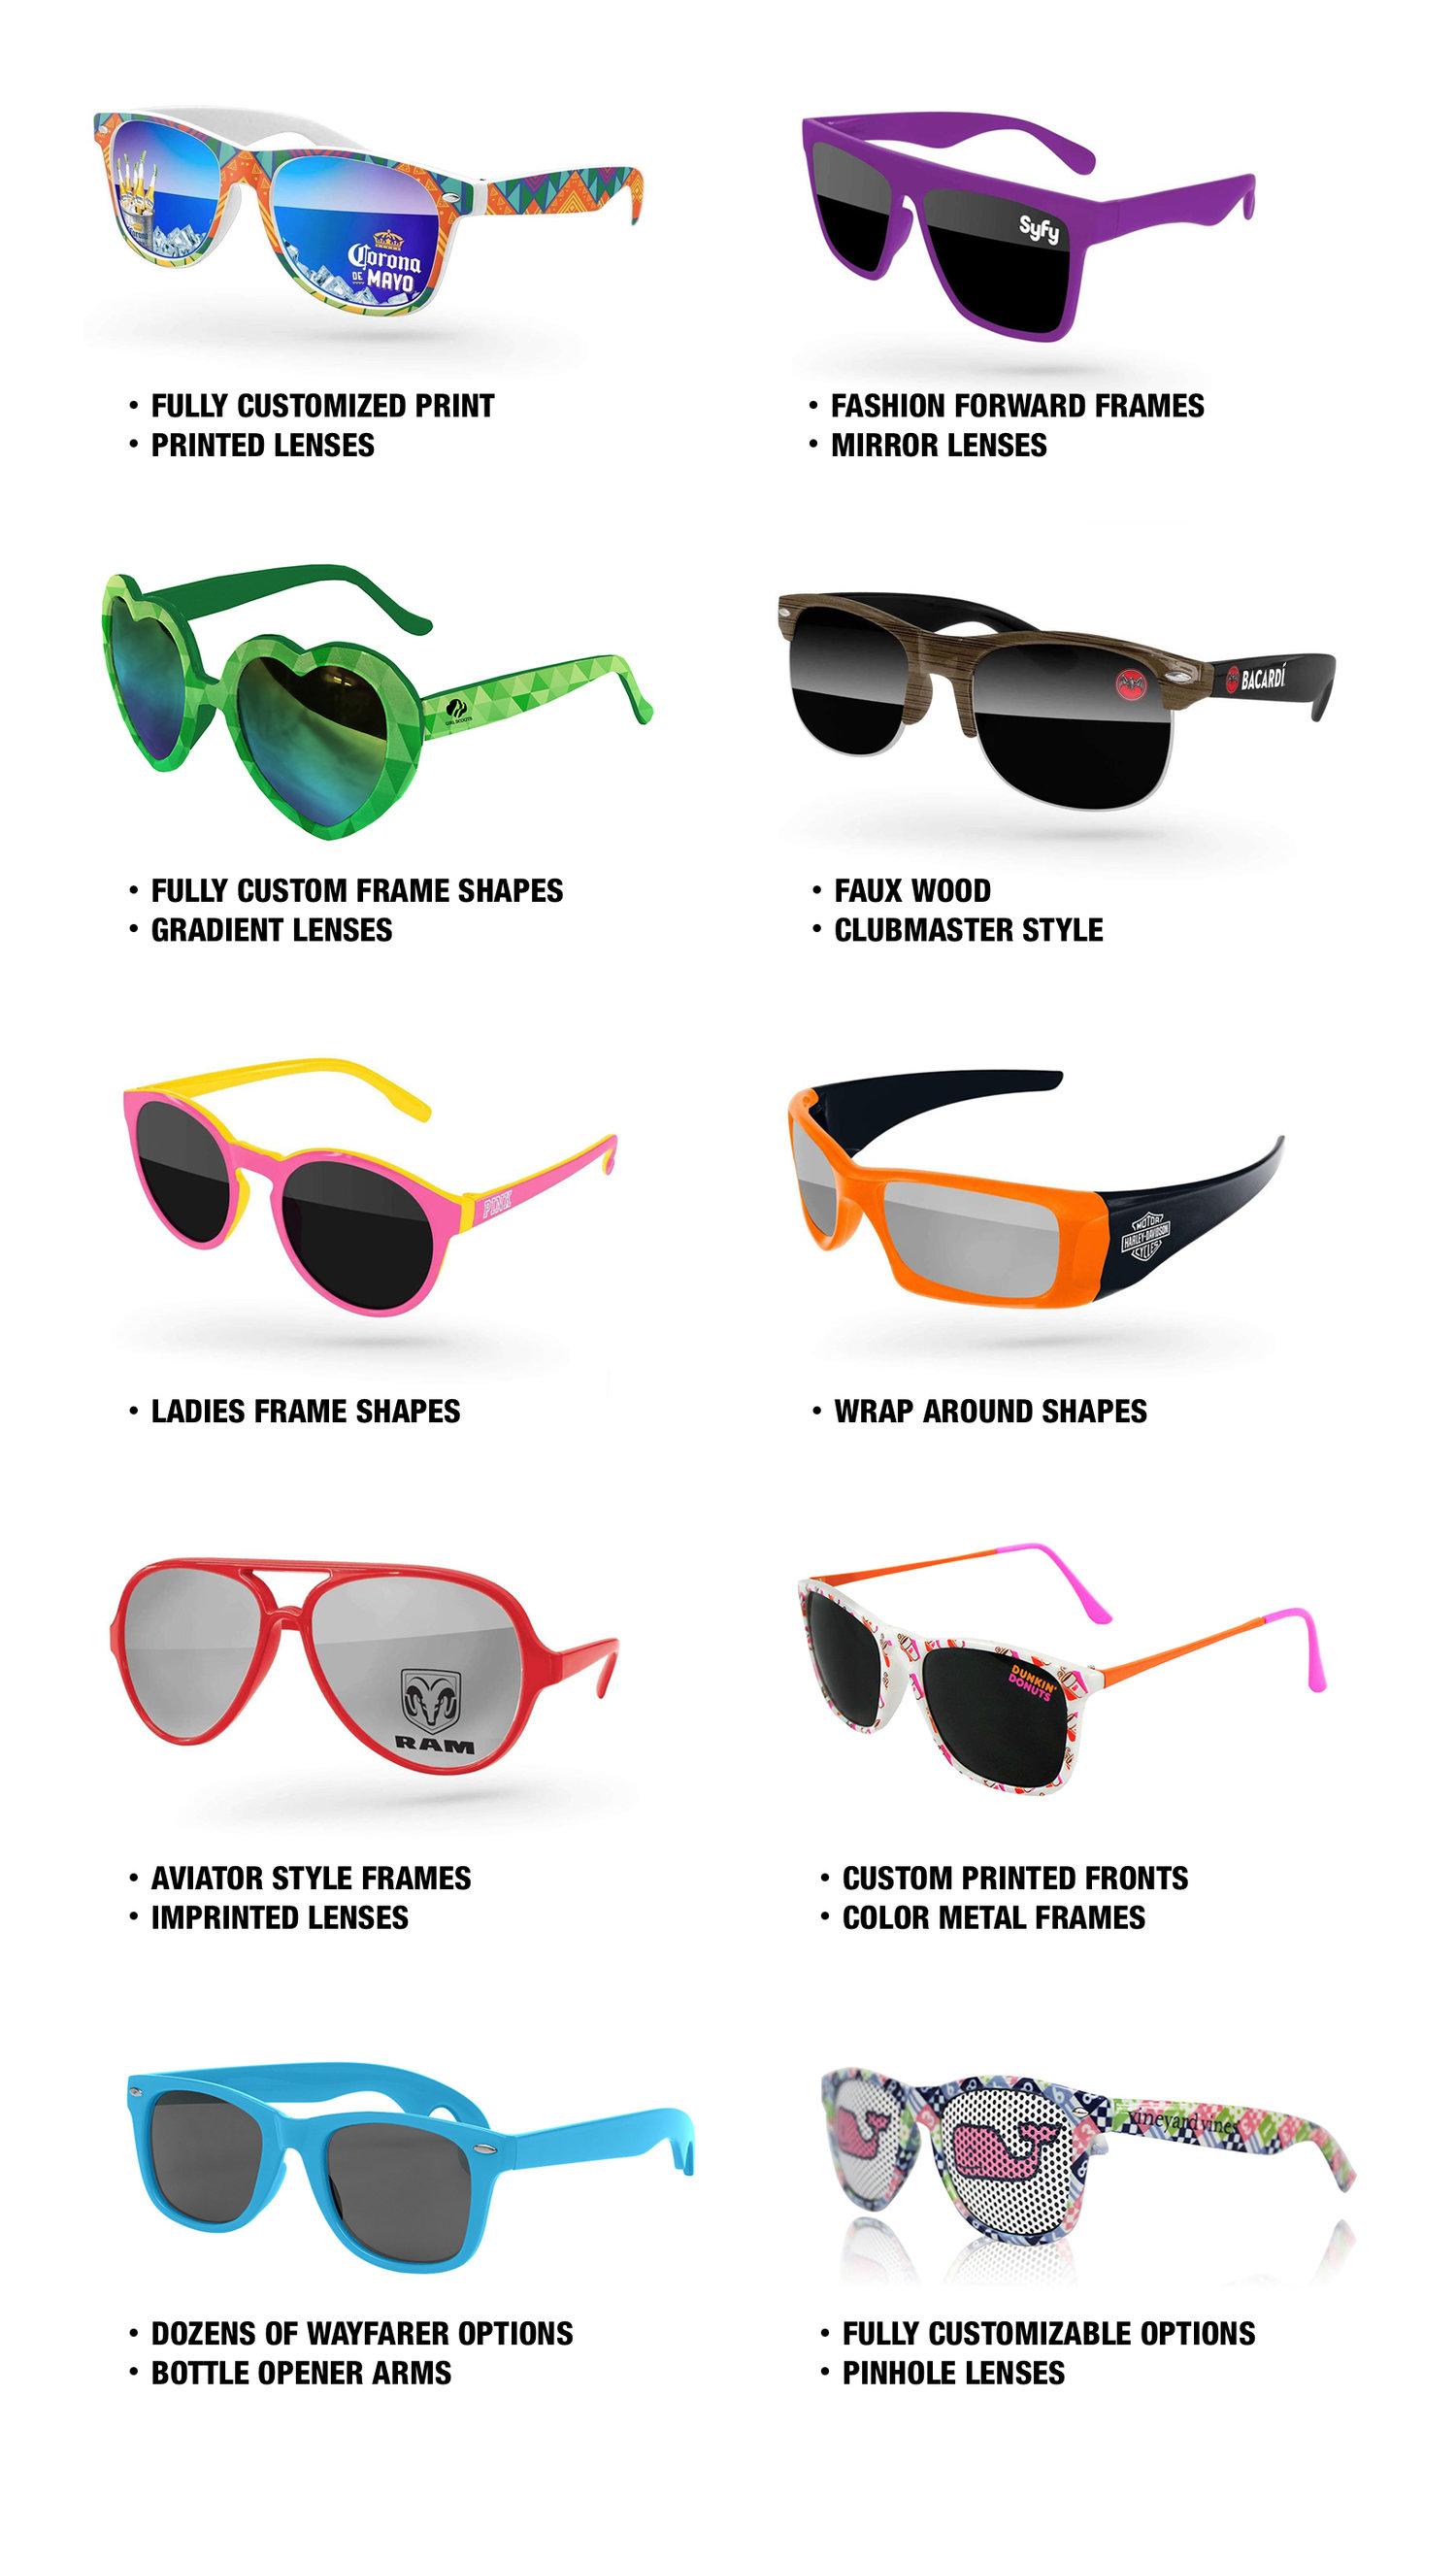 sunglassesdescriptions.jpg